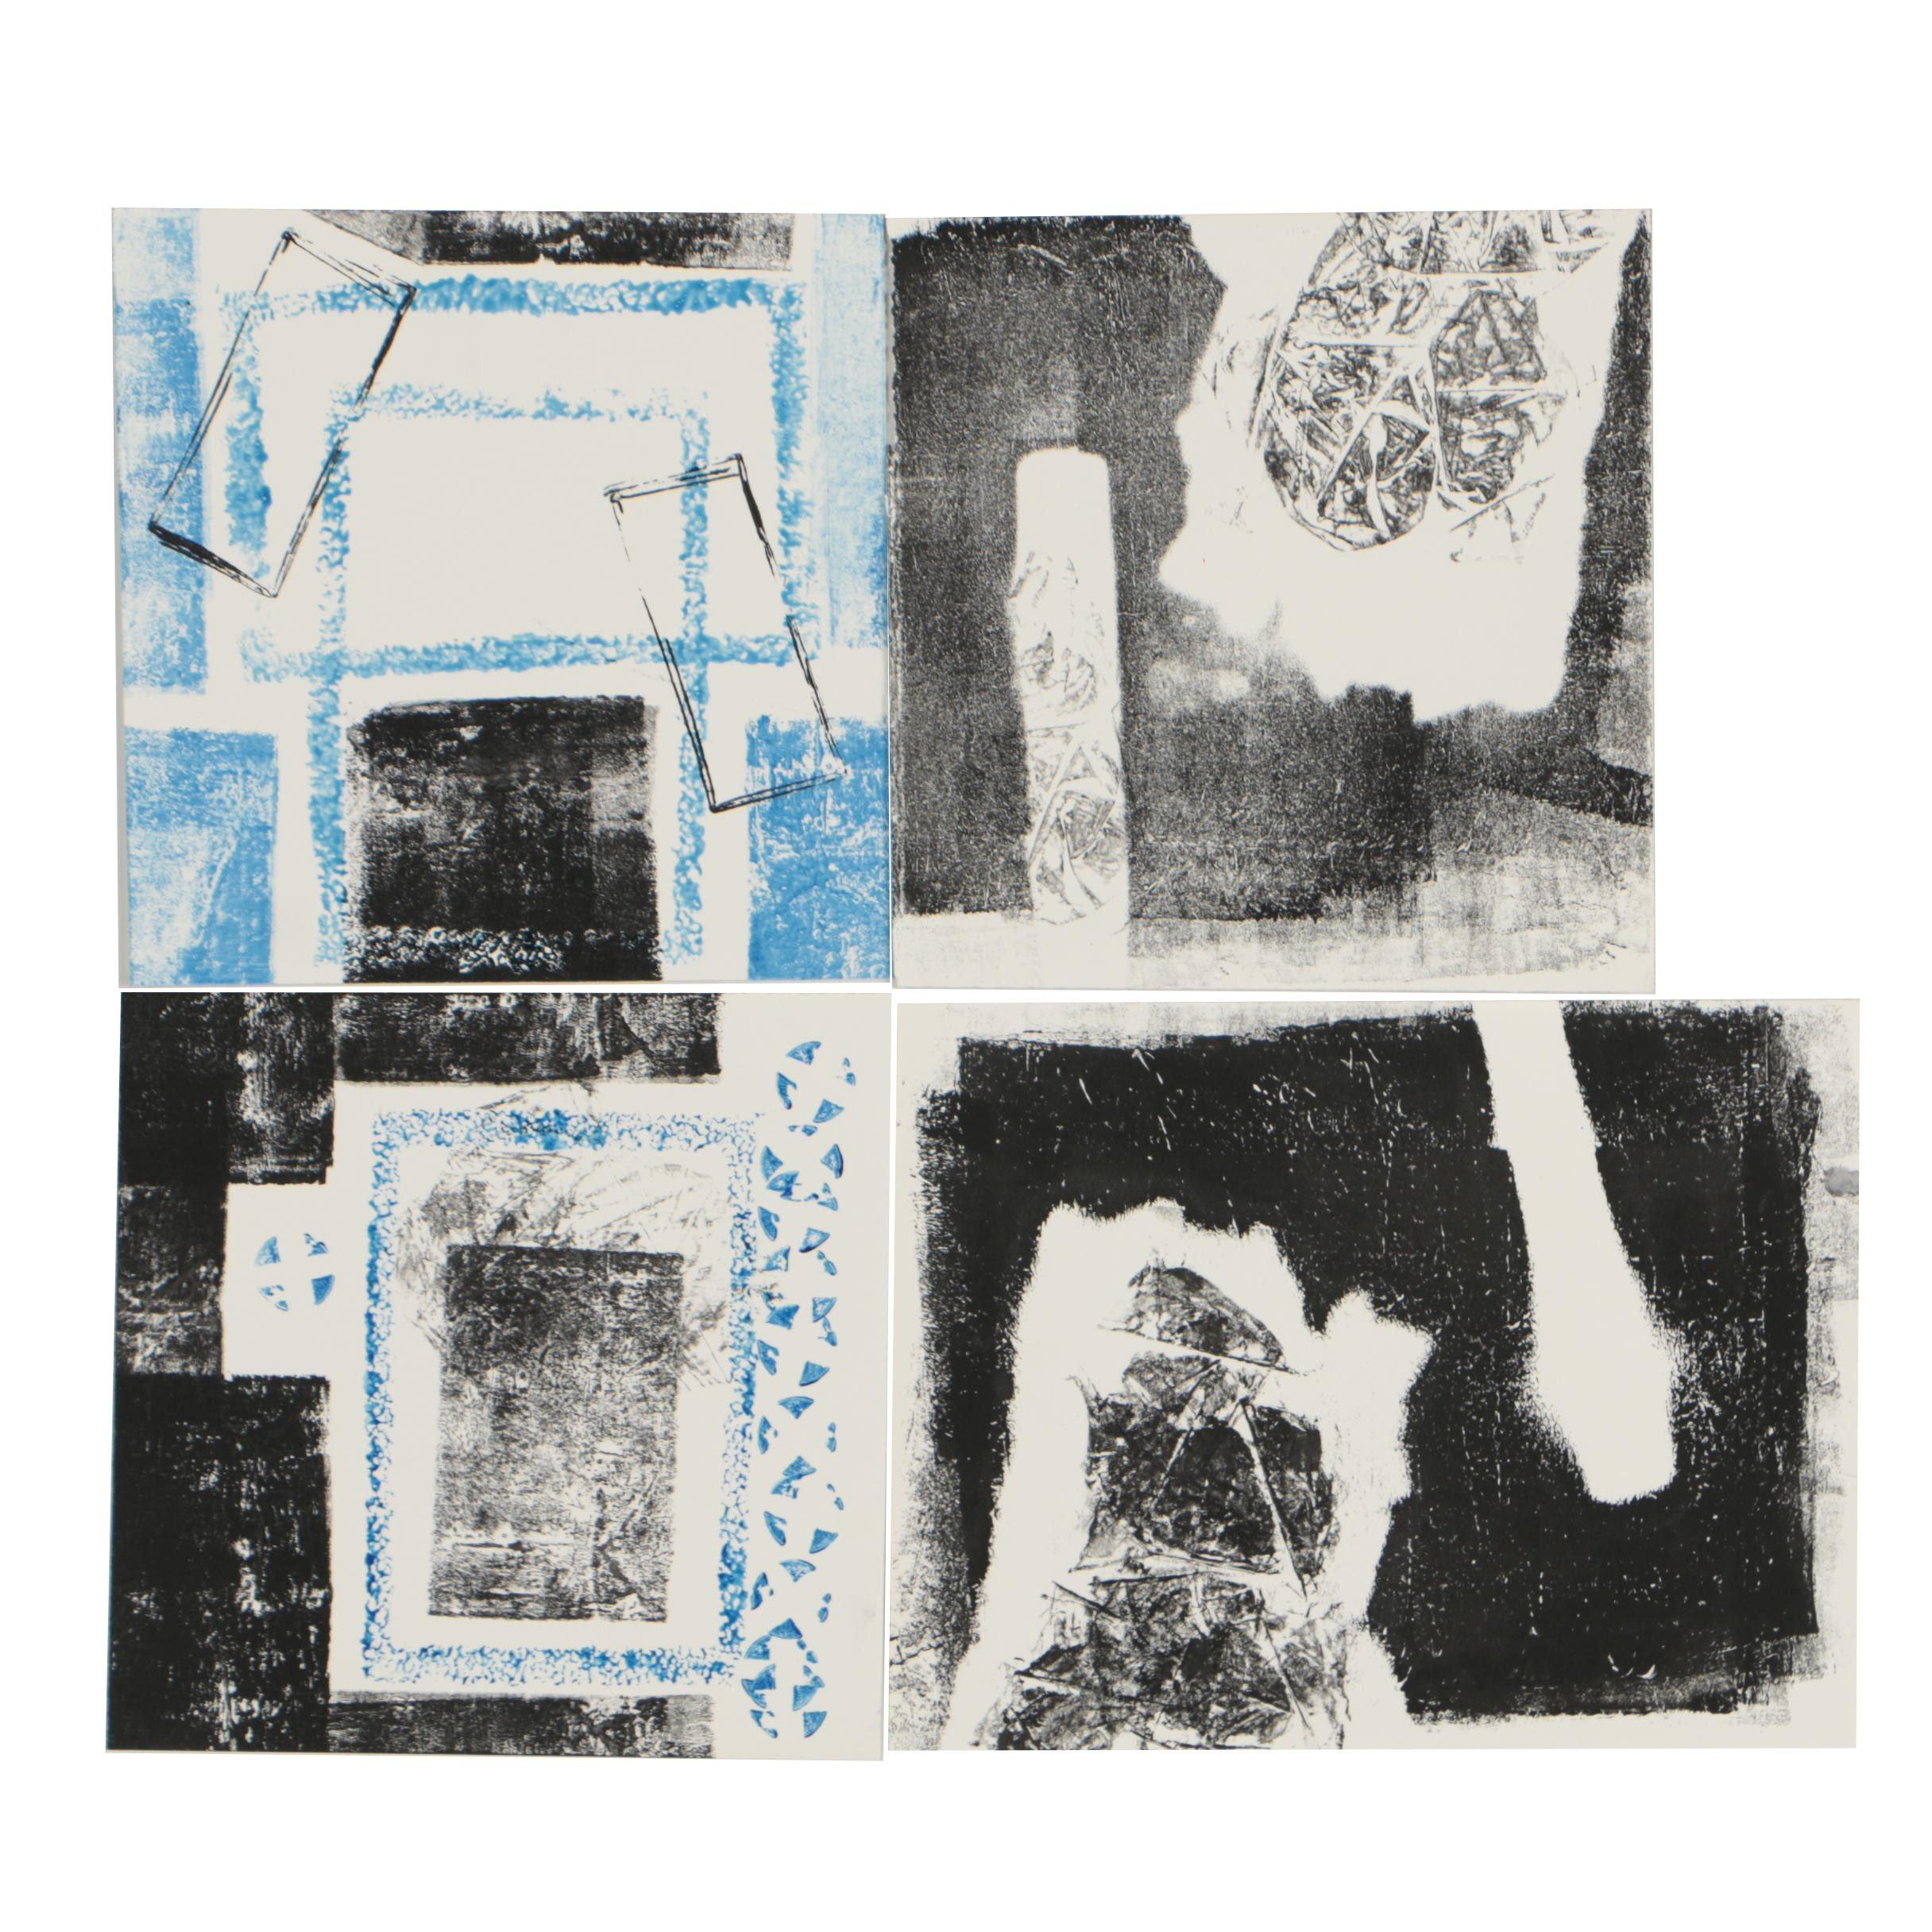 Merle Rosen Monoprints of Abstract Scenes